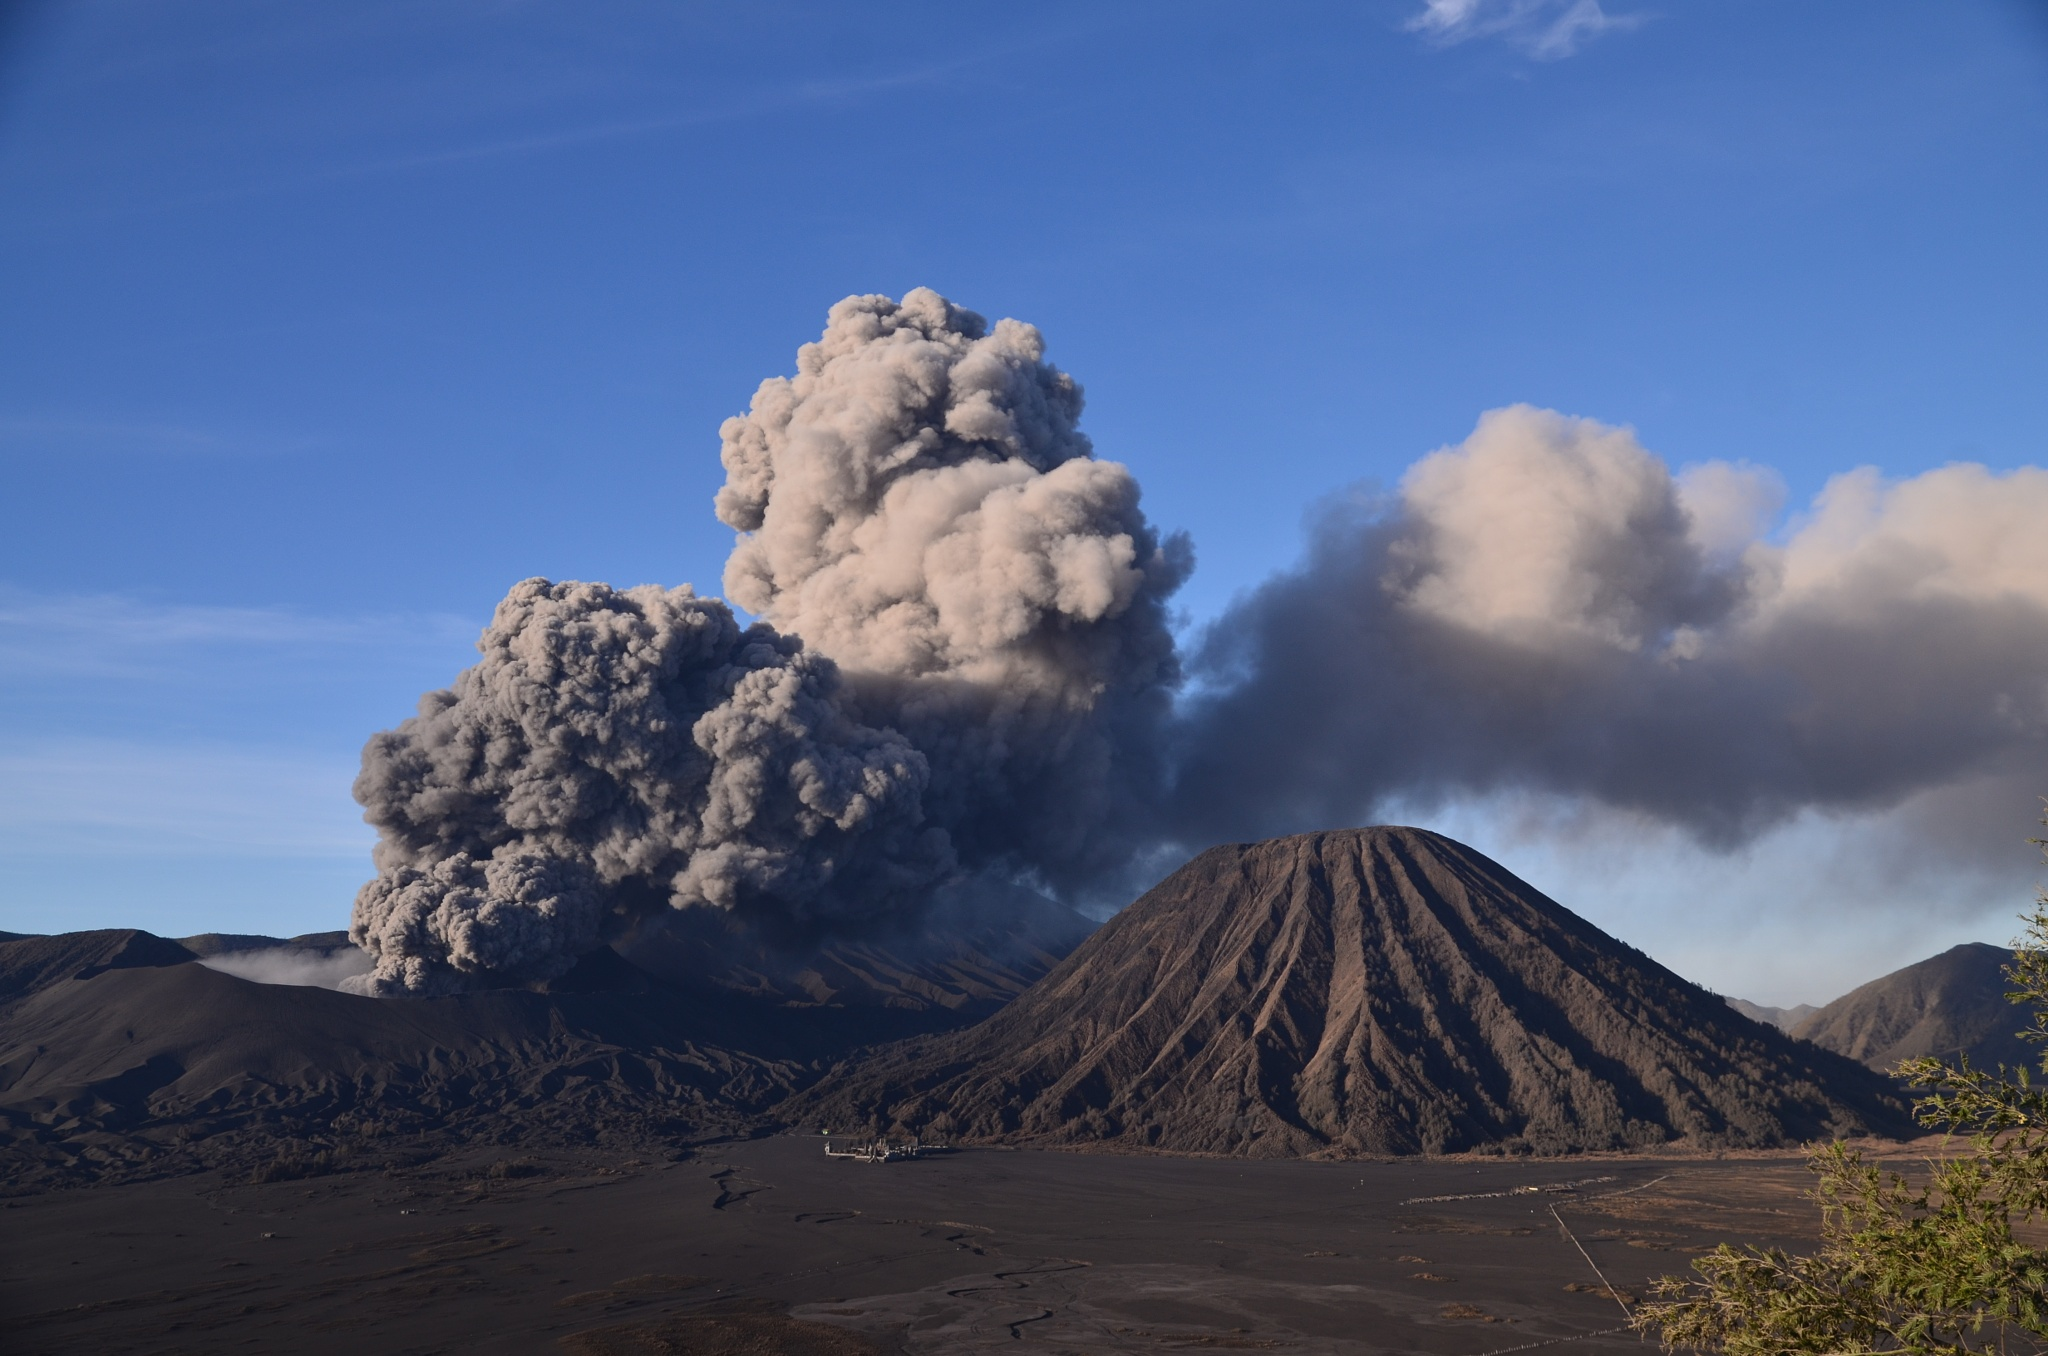 Bromo eruption East Jawa Indonesia by nurdinrivai